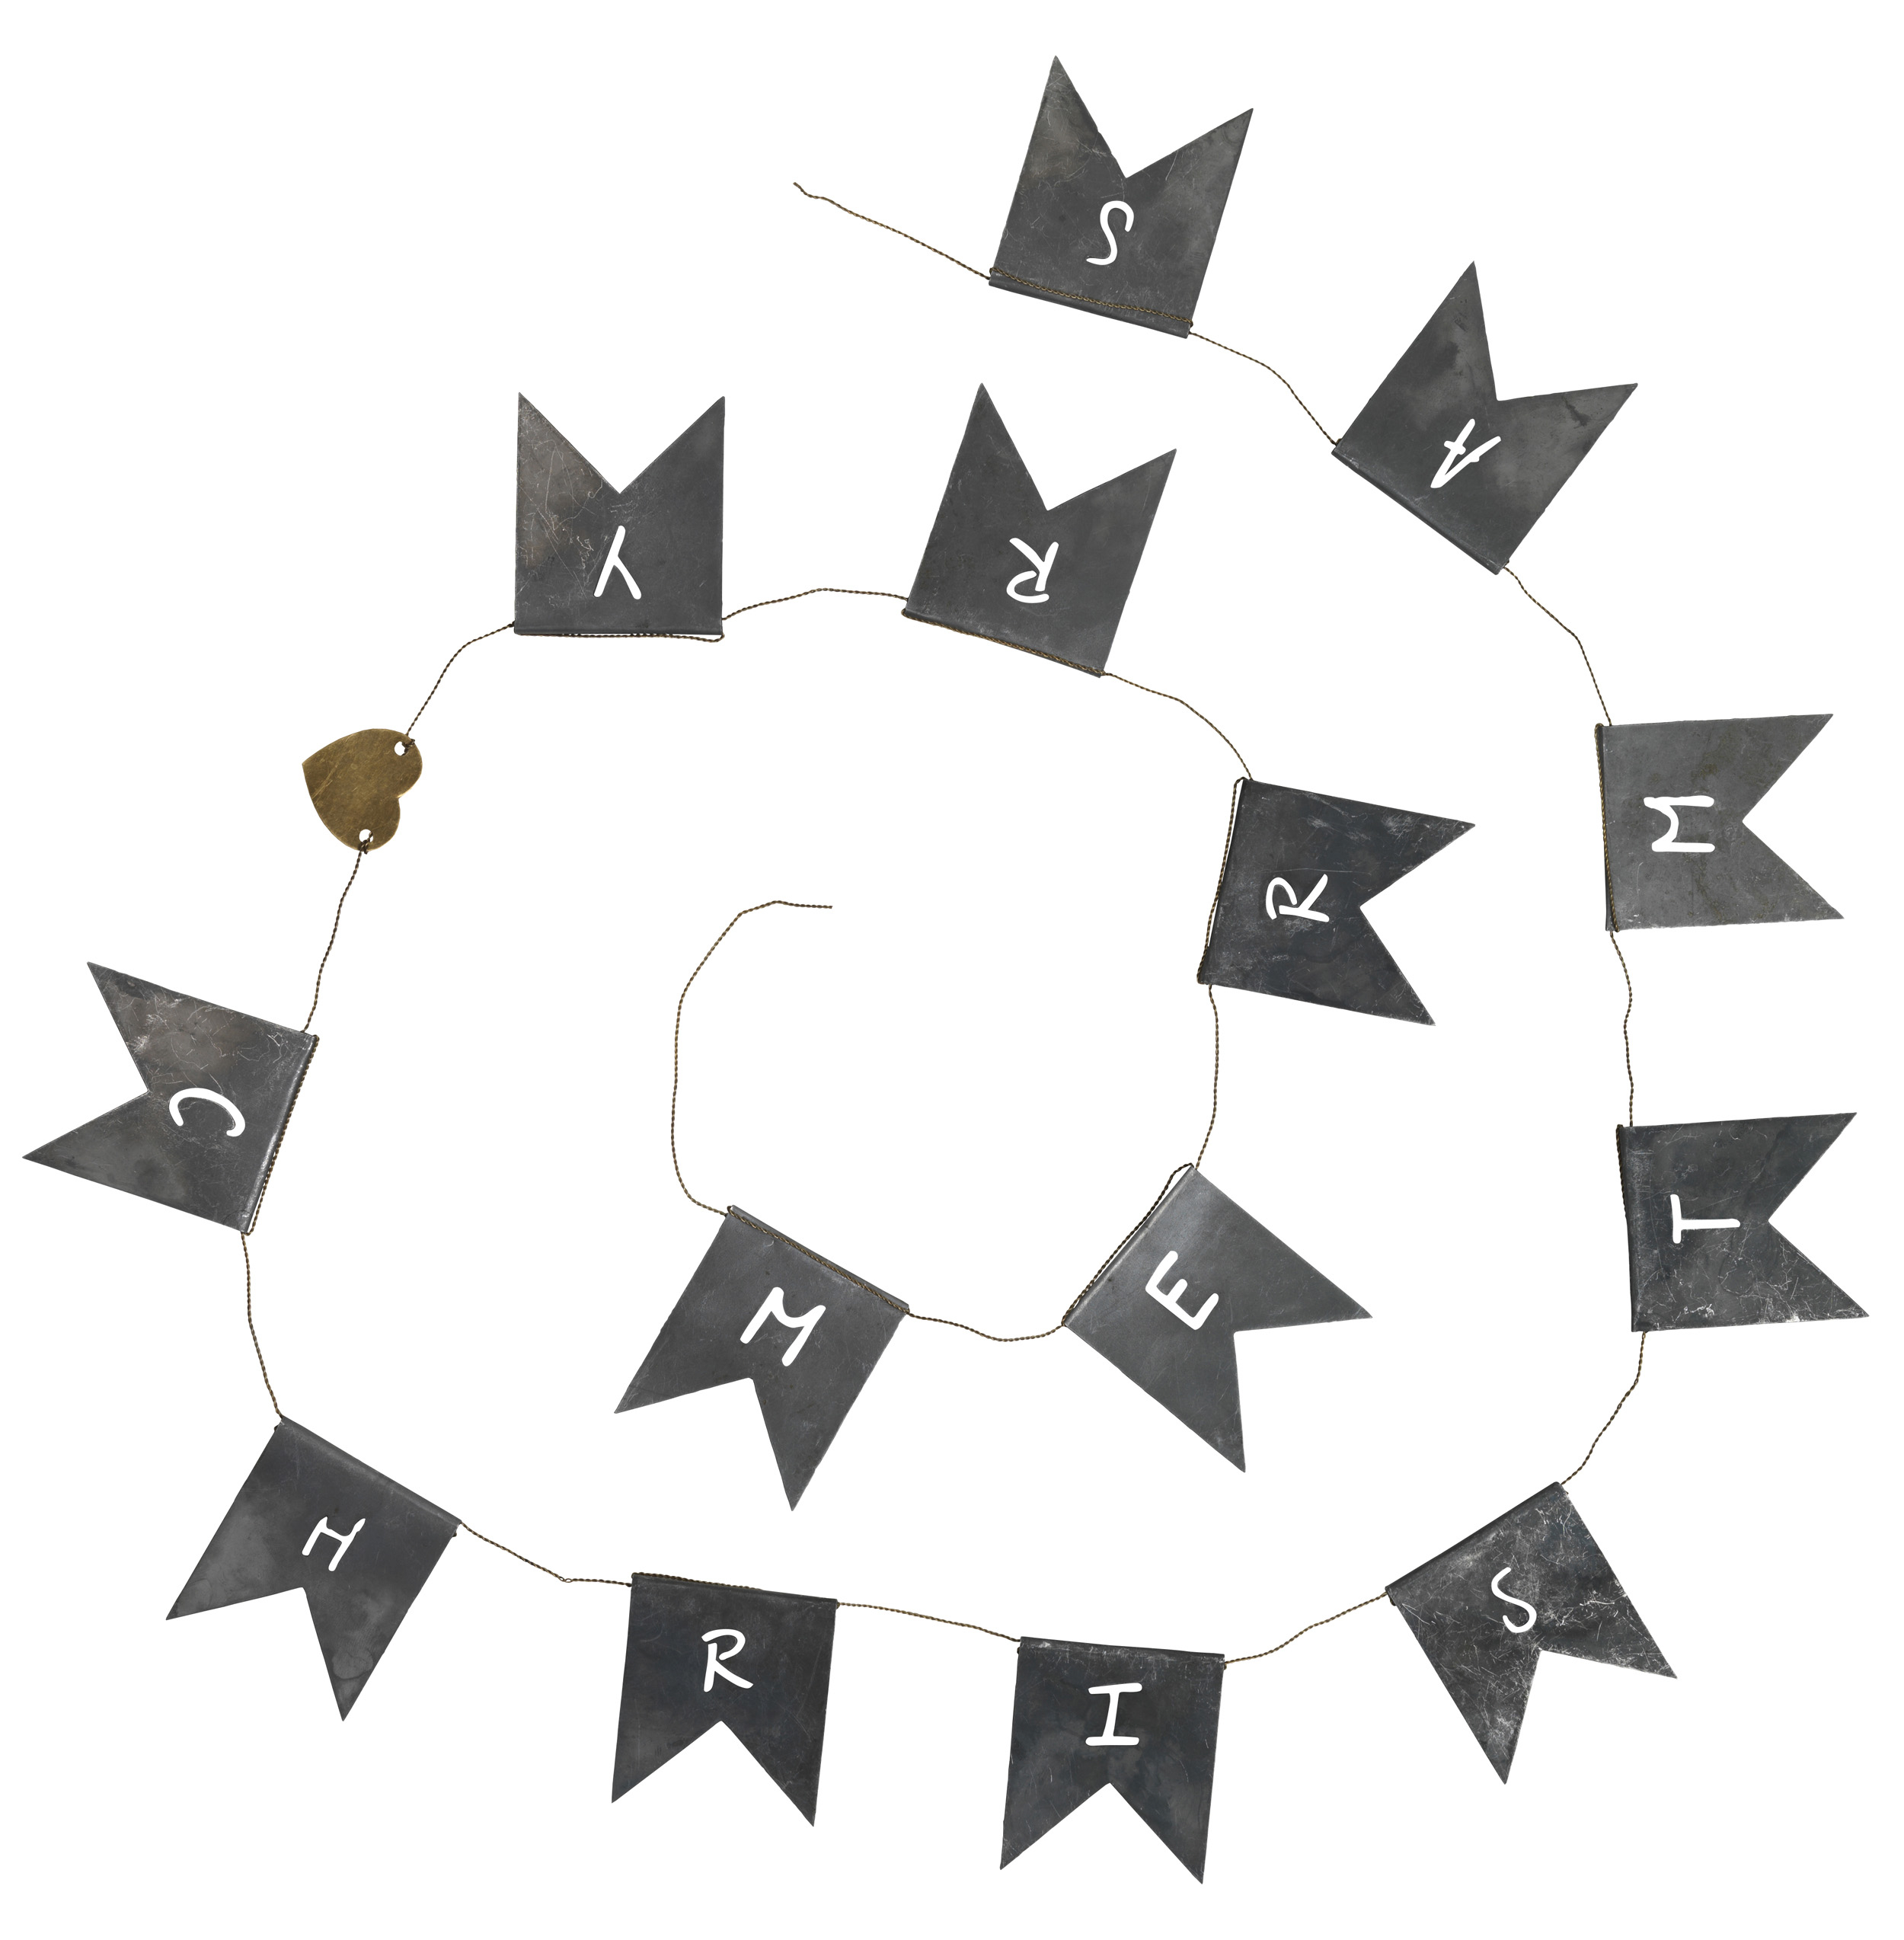 ib laursen merry christmas band deko girlande metall weihnachtsdeko 158 cm